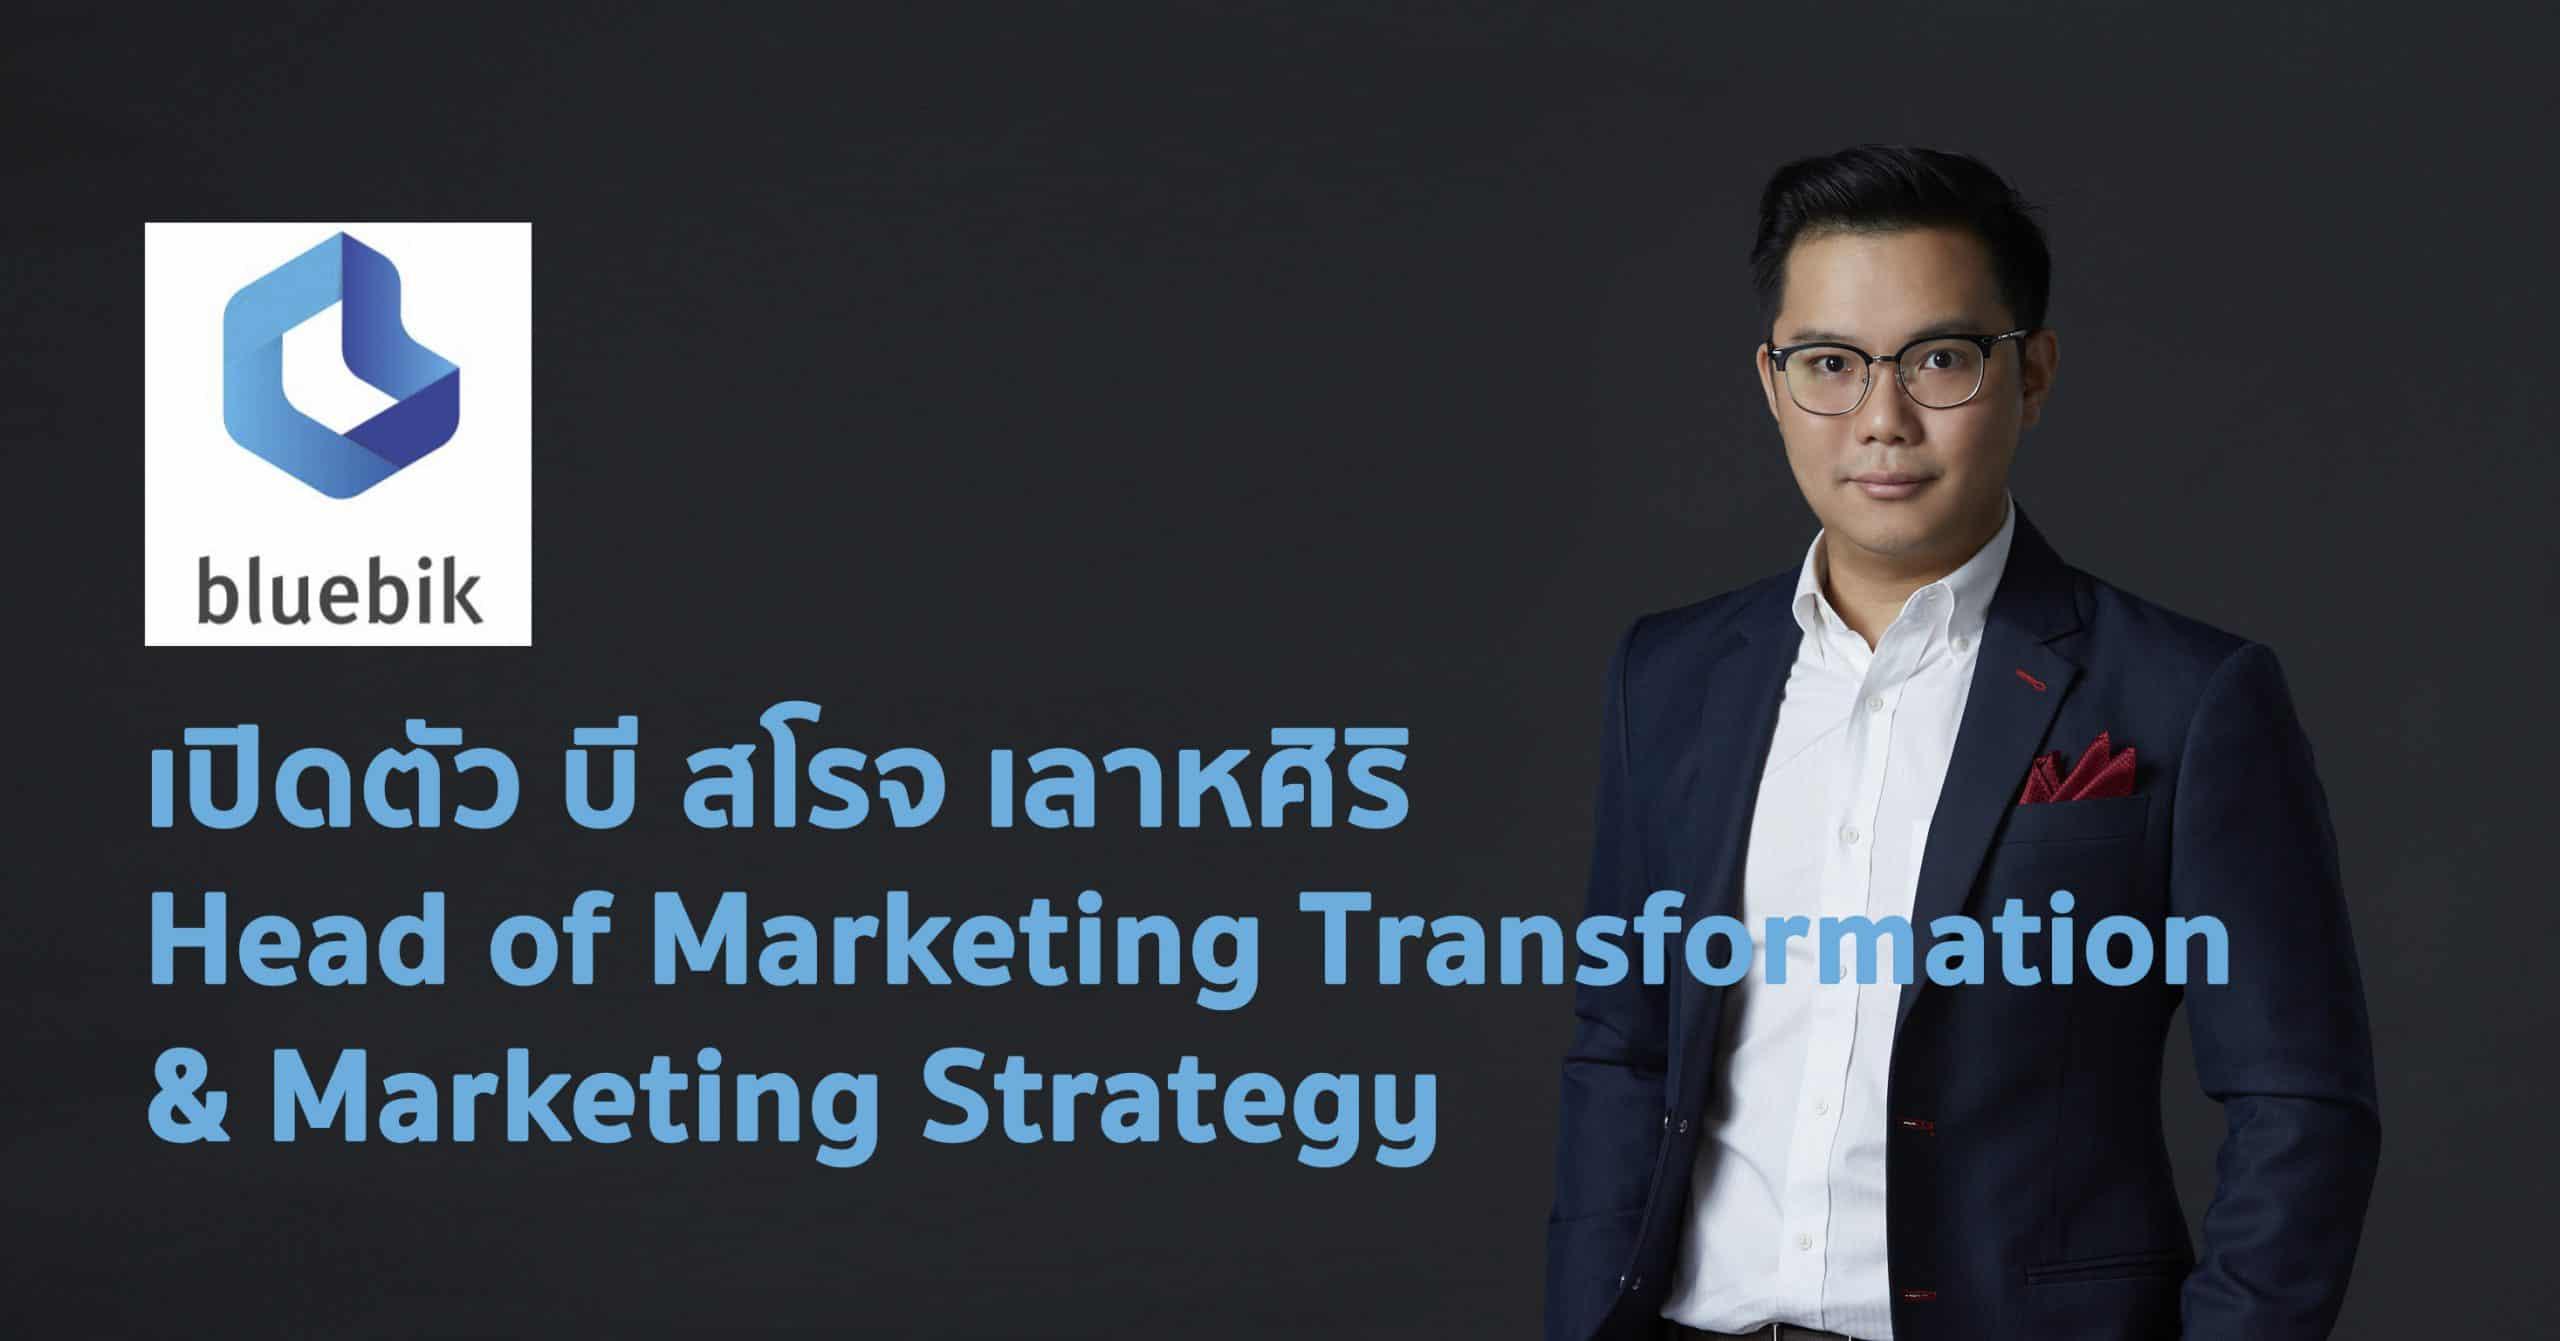 Bluebik เปิดตัว บี สโรจ เลาหศิริ Head of Marketing Transformation